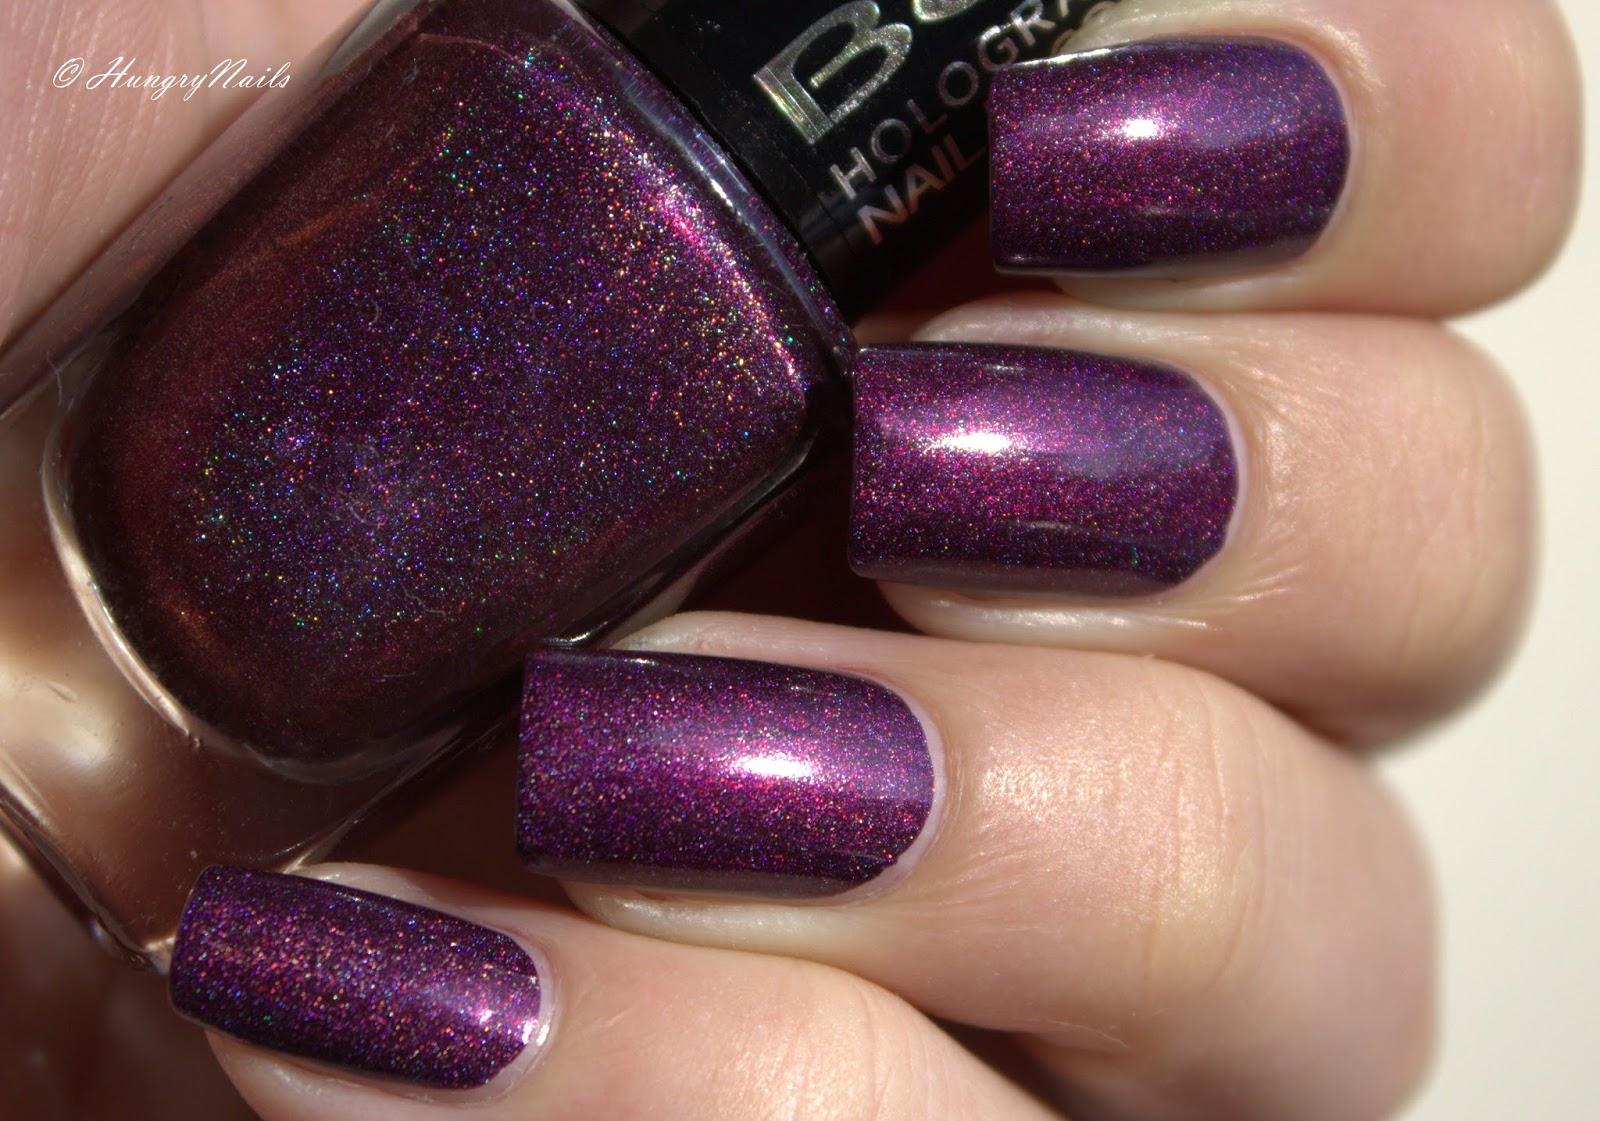 swatches beyu holographic violet illusion hungrynails blog die bunte welt der nagellacke. Black Bedroom Furniture Sets. Home Design Ideas